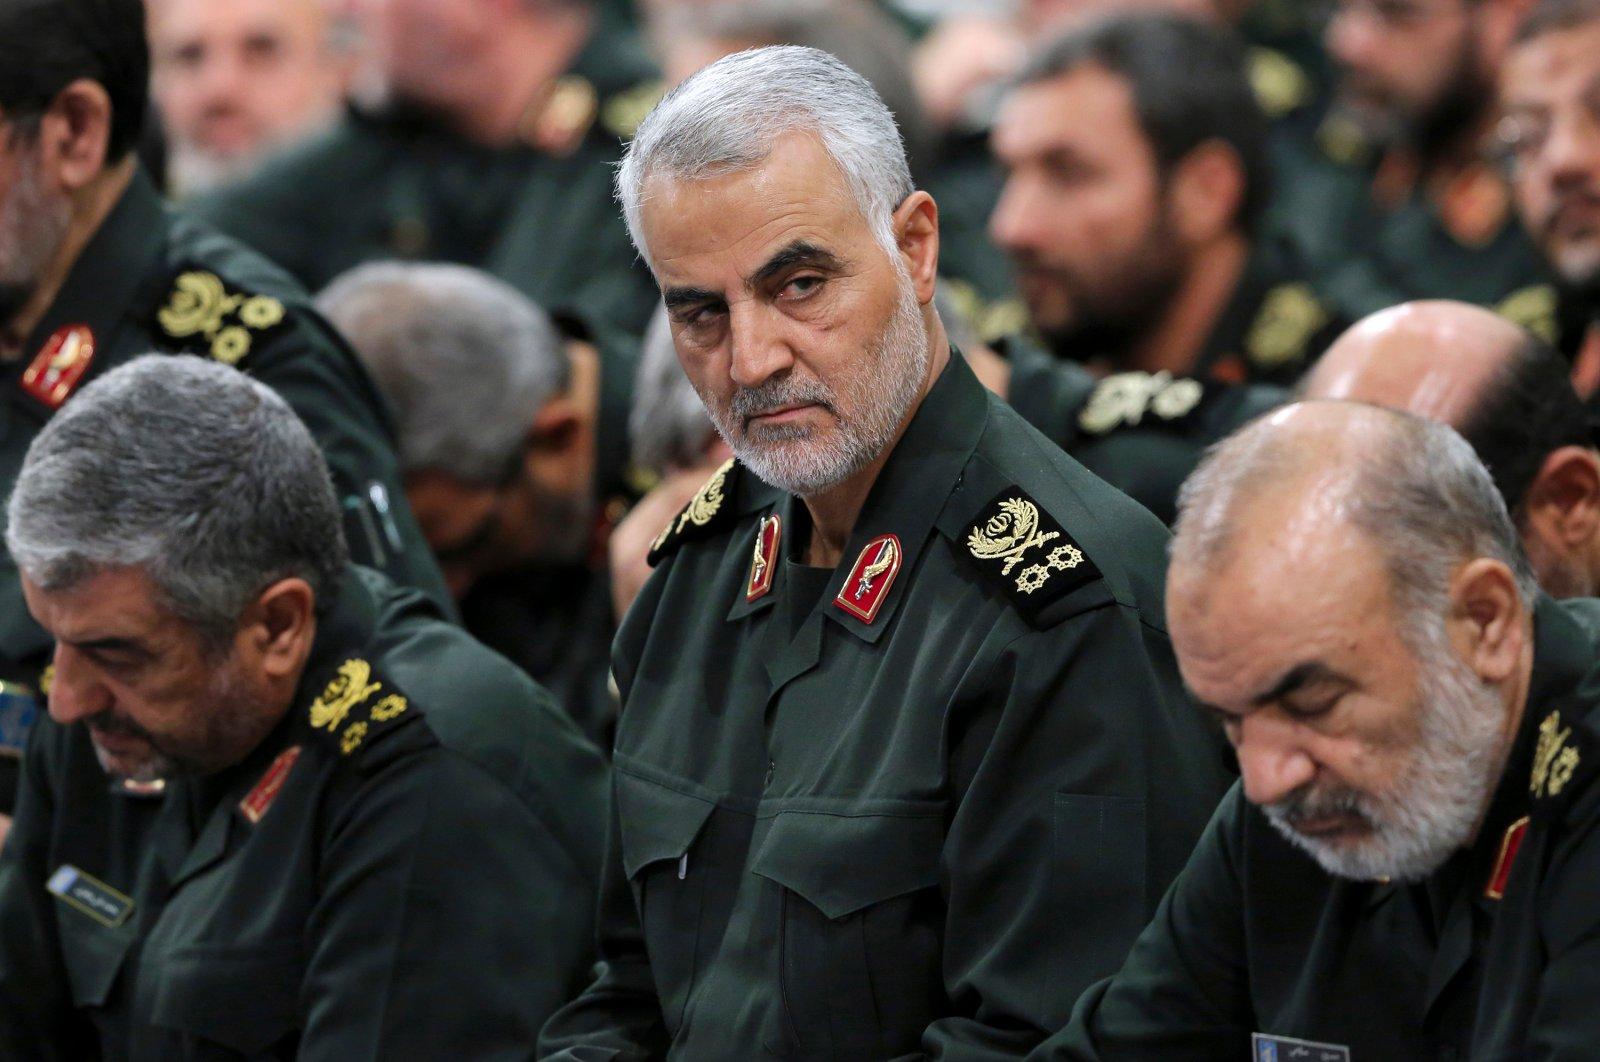 In this undated file photo, former Revolutionary Guard Gen. Qassem Soleimani (C) attends a meeting in Tehran, Iran. (AP Photo)